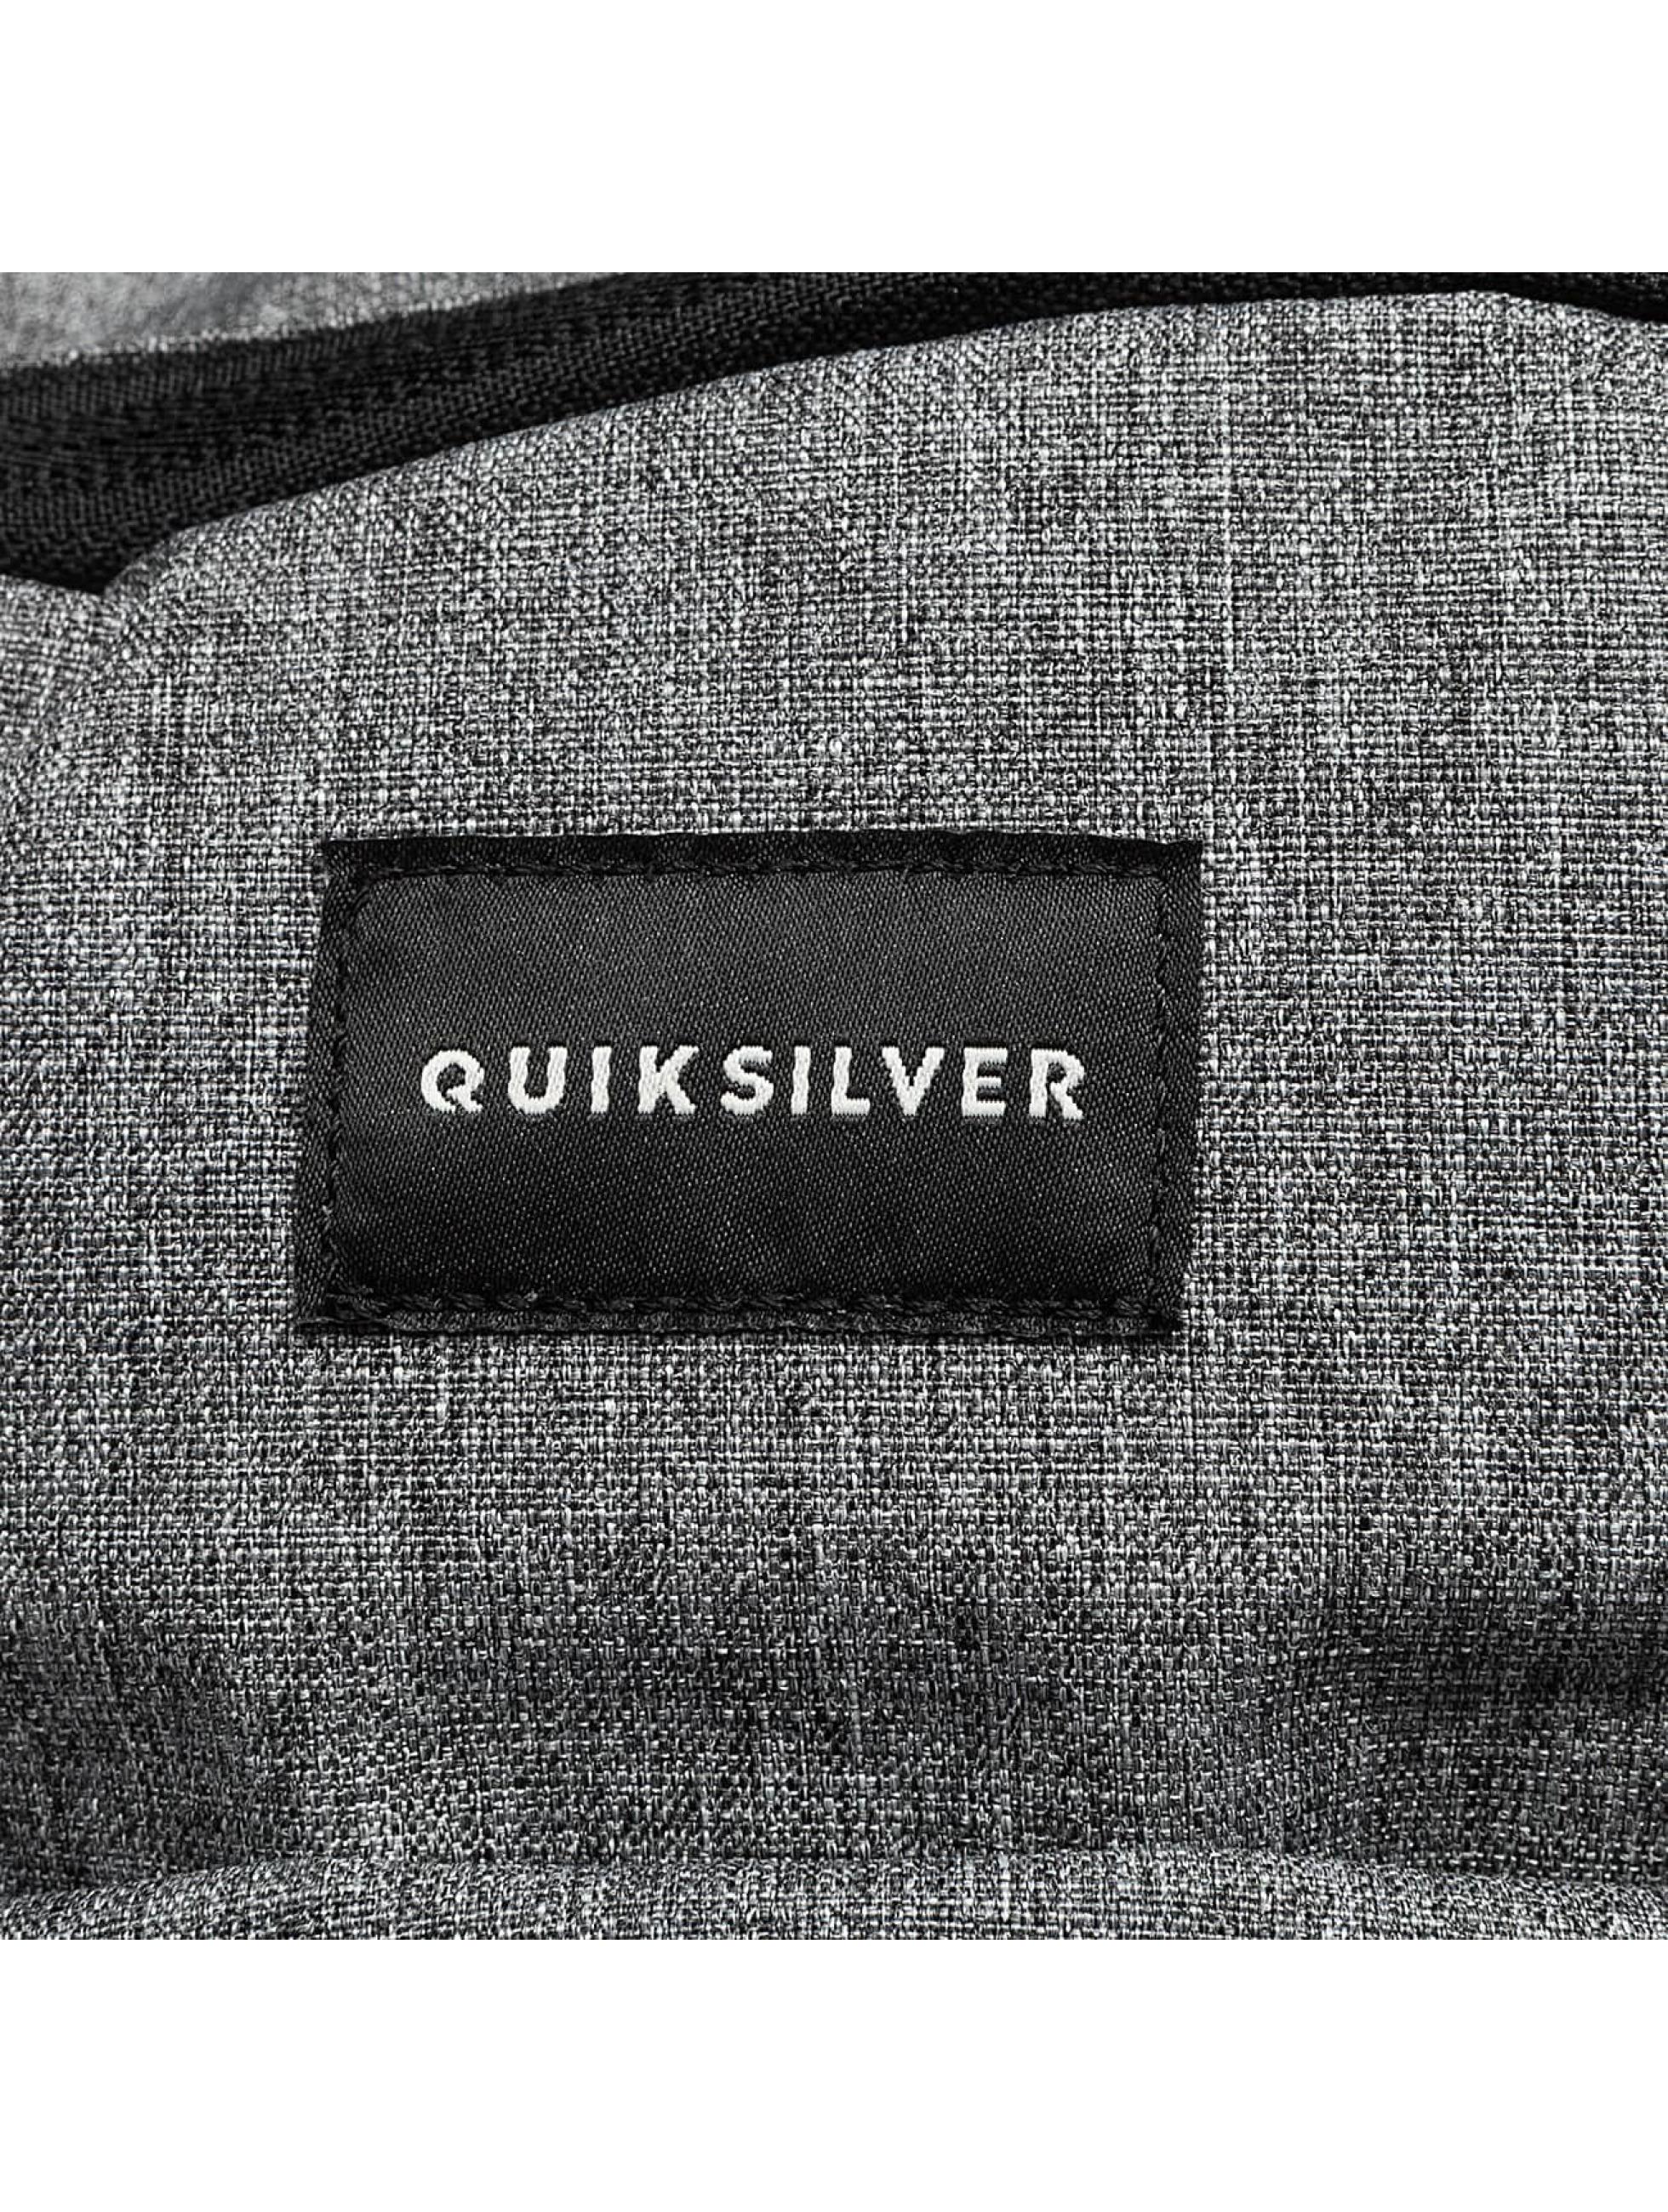 Quiksilver Zaino Burst grigio